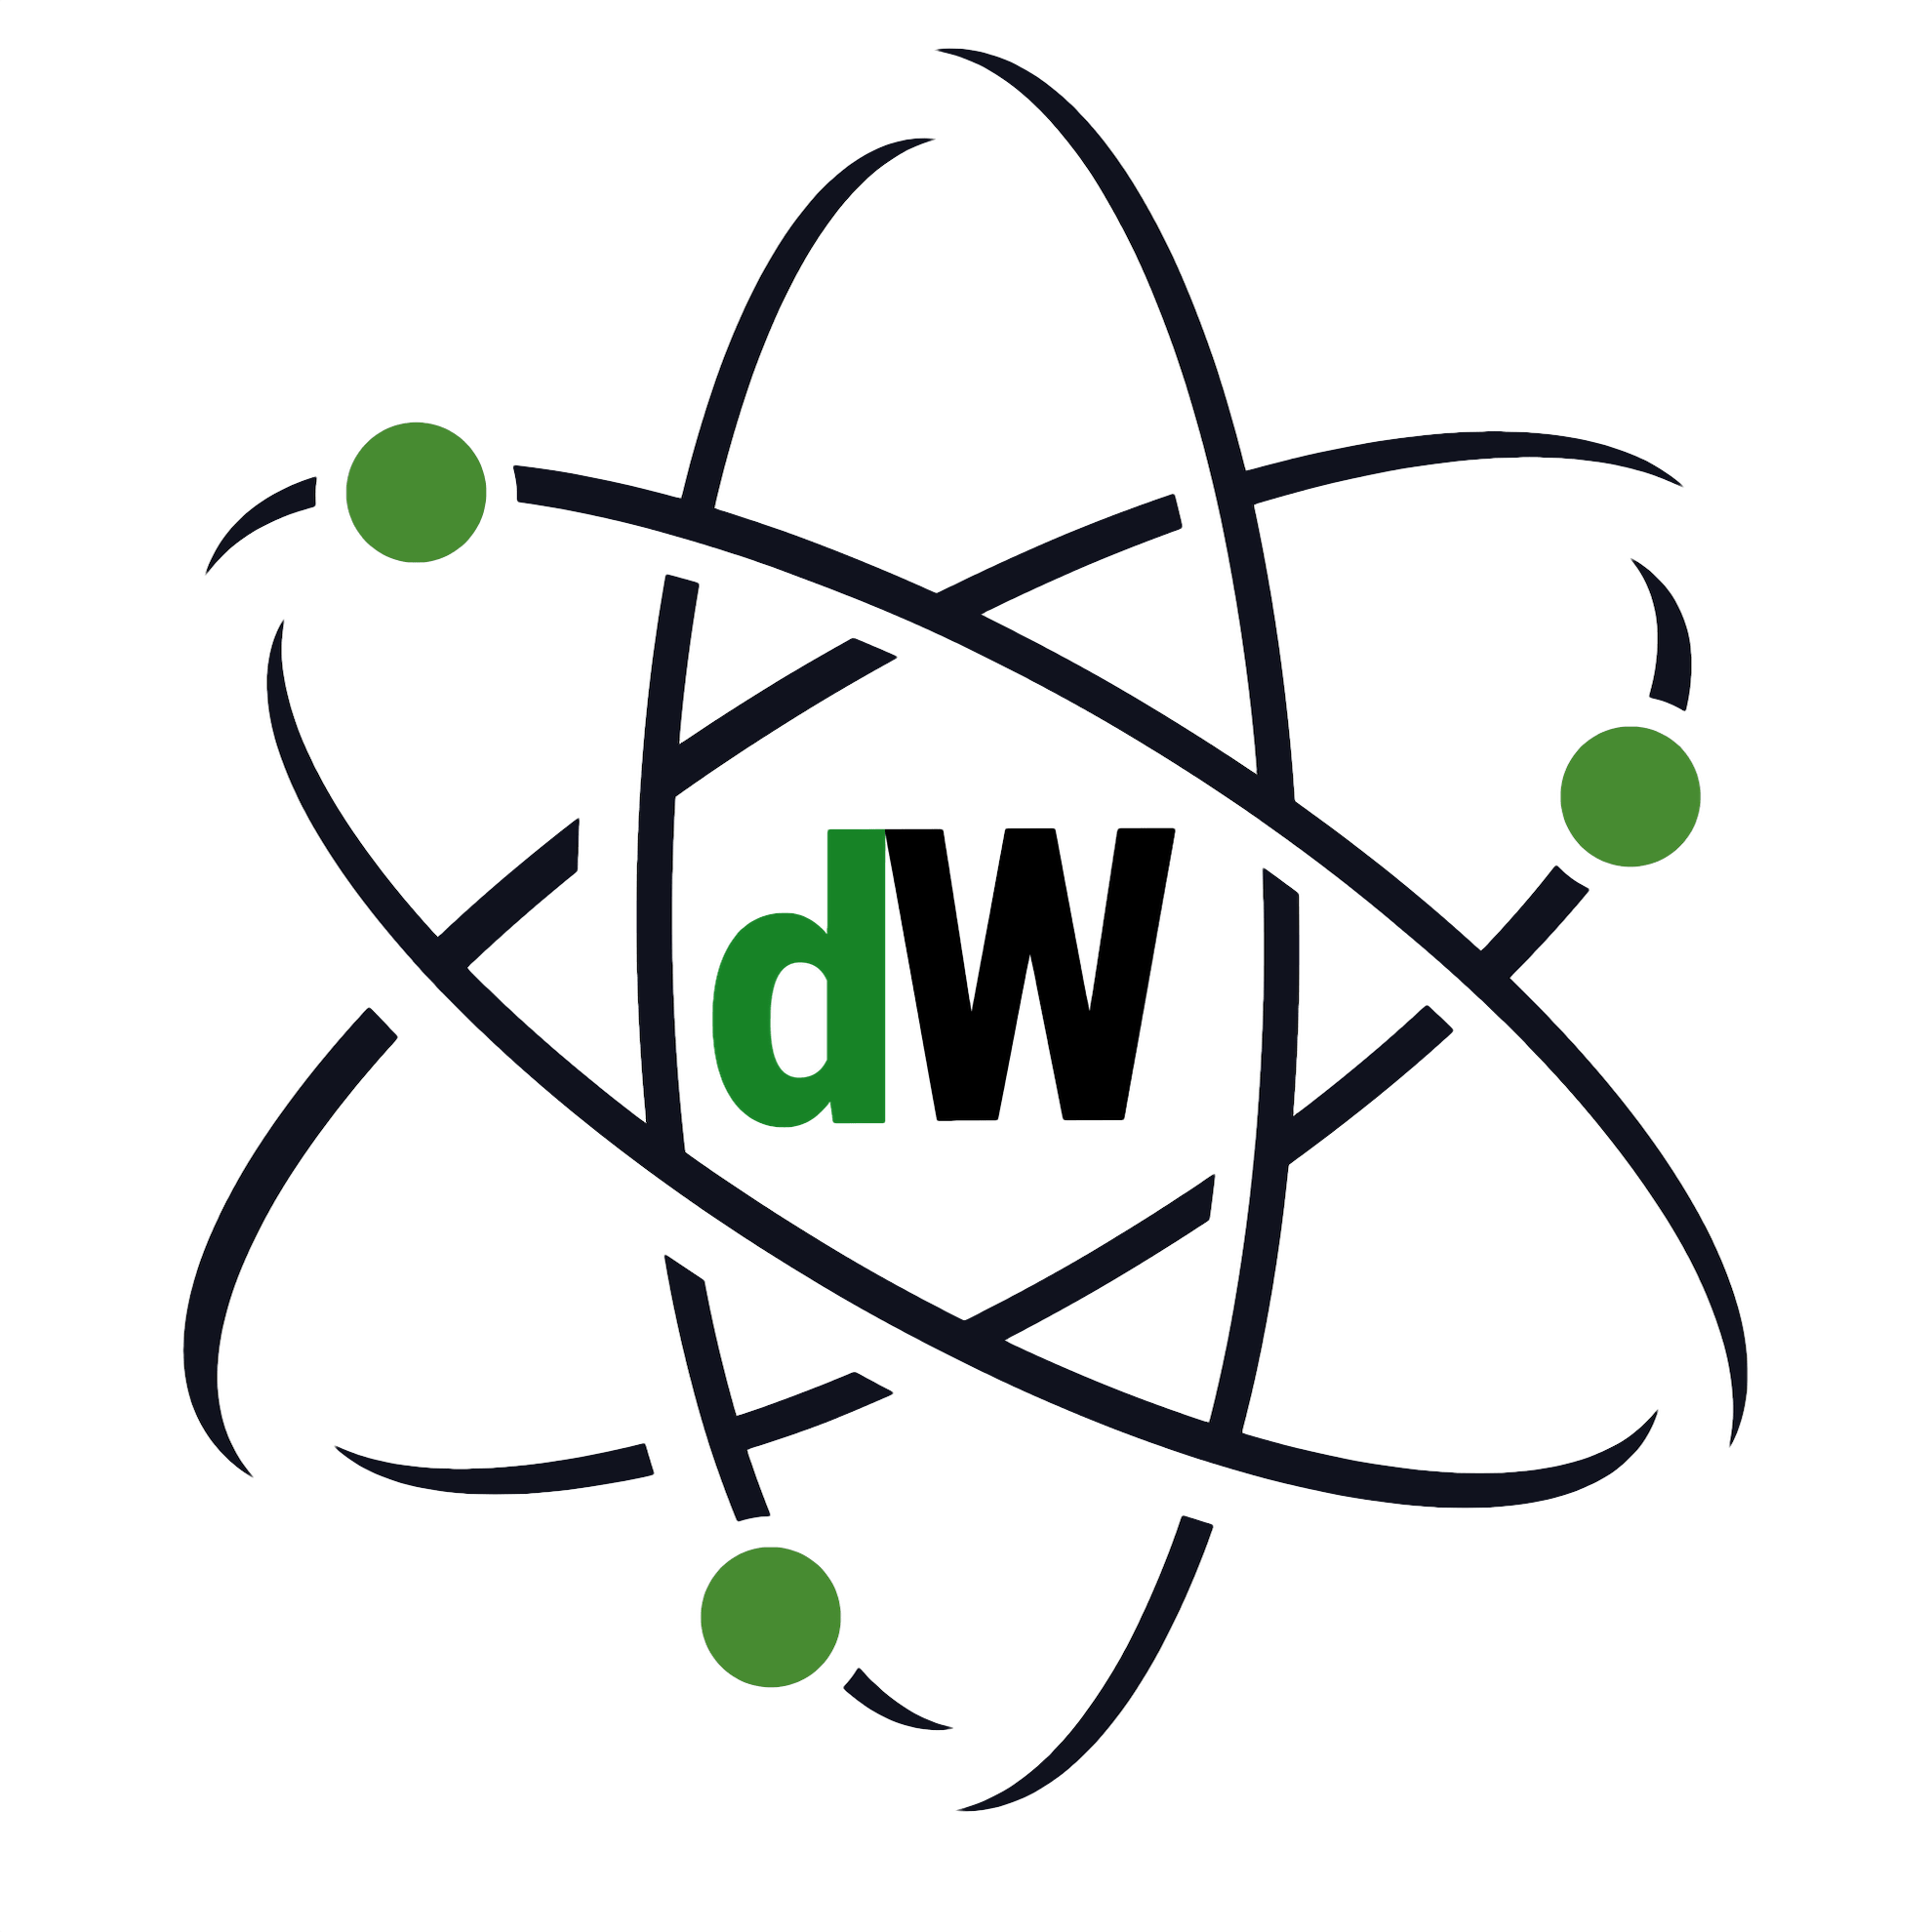 https://de-waste.com/logo.png